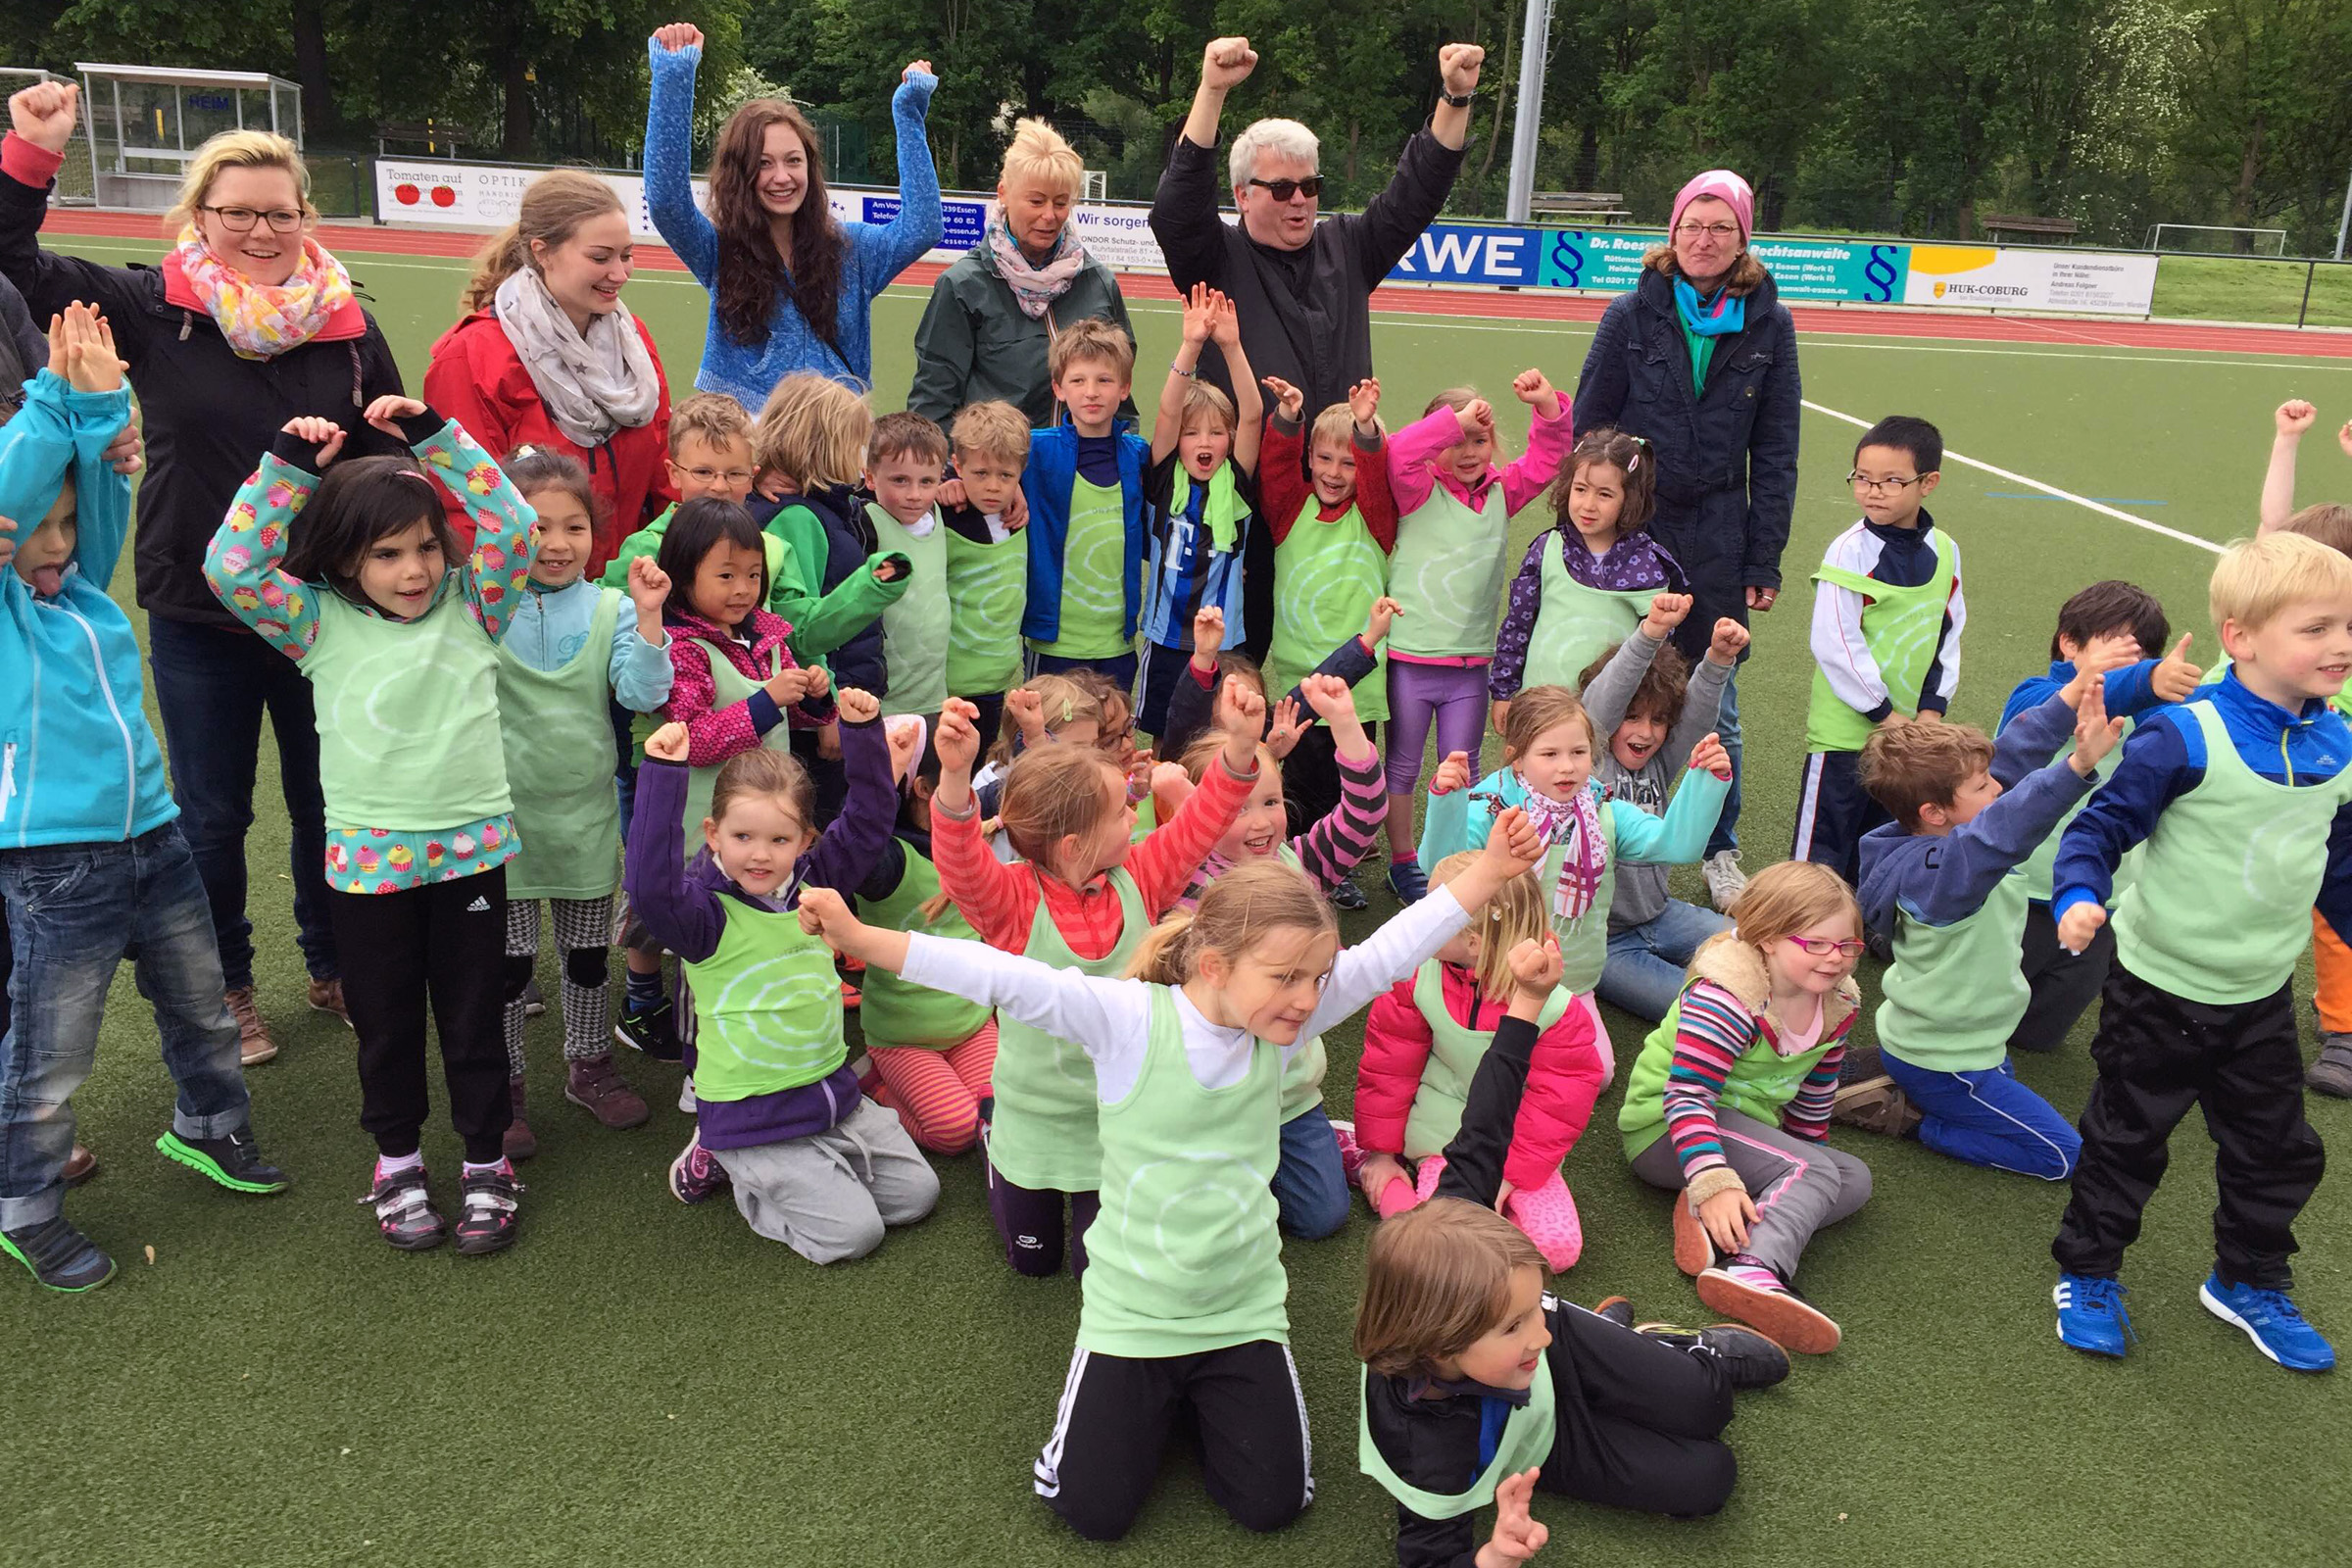 20150519_KitaLummerland_Sportabzeichen_03.JPG